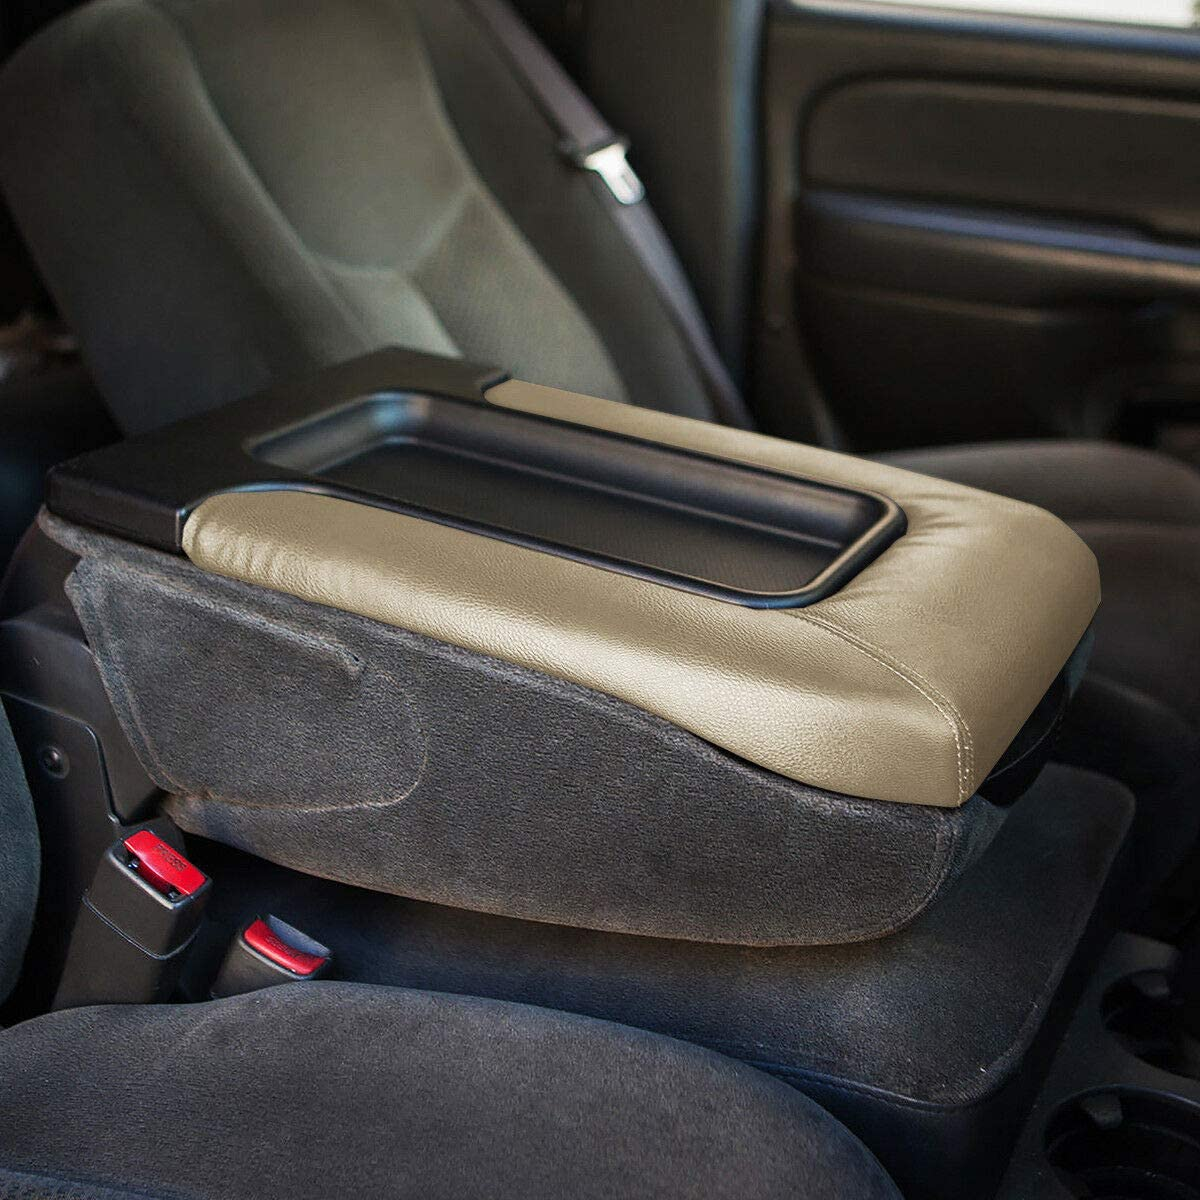 LSAILON Center Console Organizer Lid Repair Kit Best for 99-09 for Volkswagen R32 Black